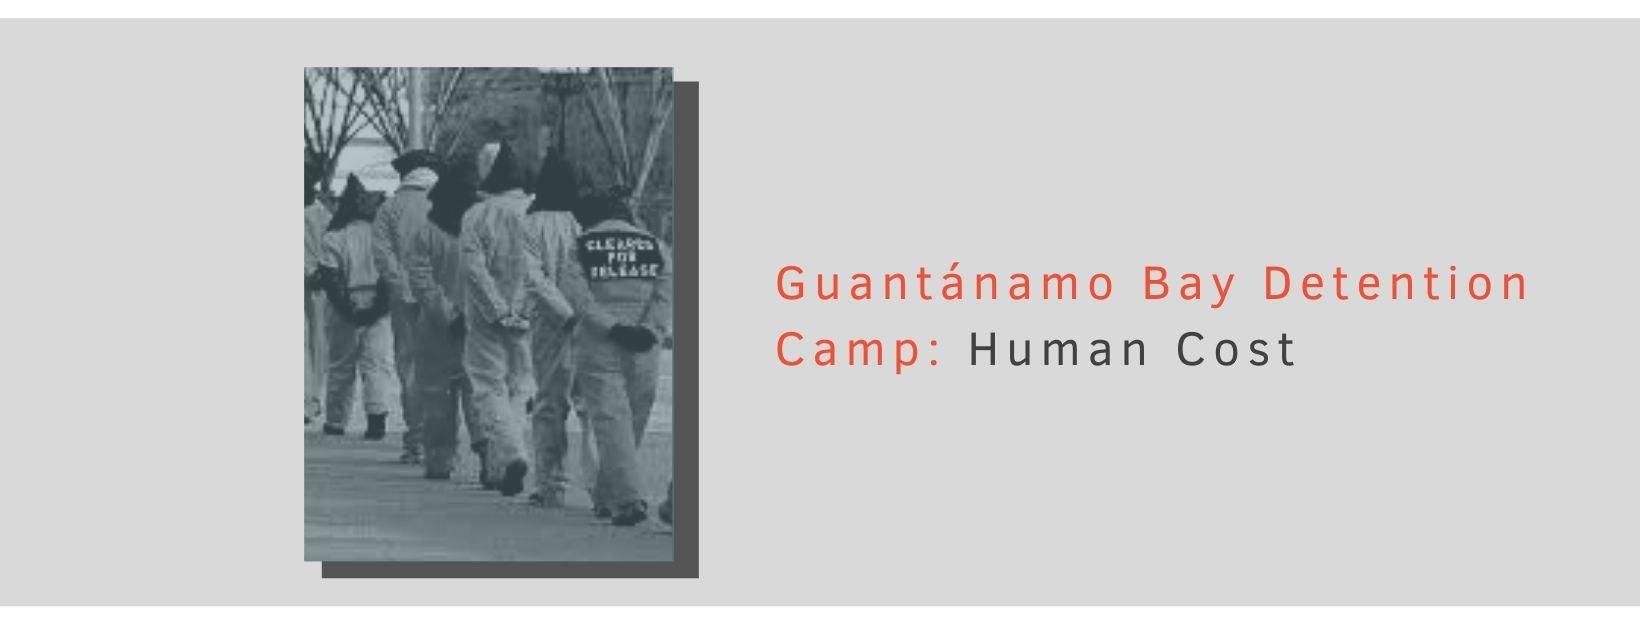 prisoners in guantanamo bay detention center